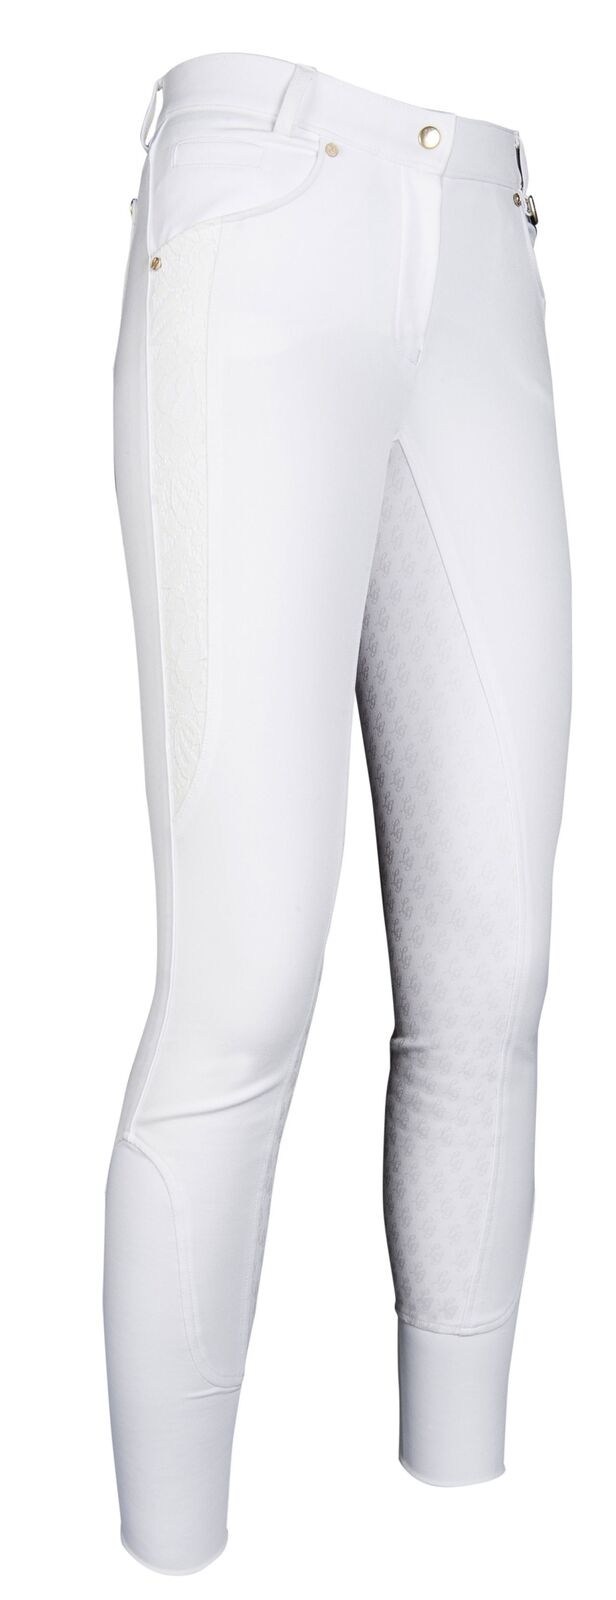 HKM montar torneo pantalones Lace